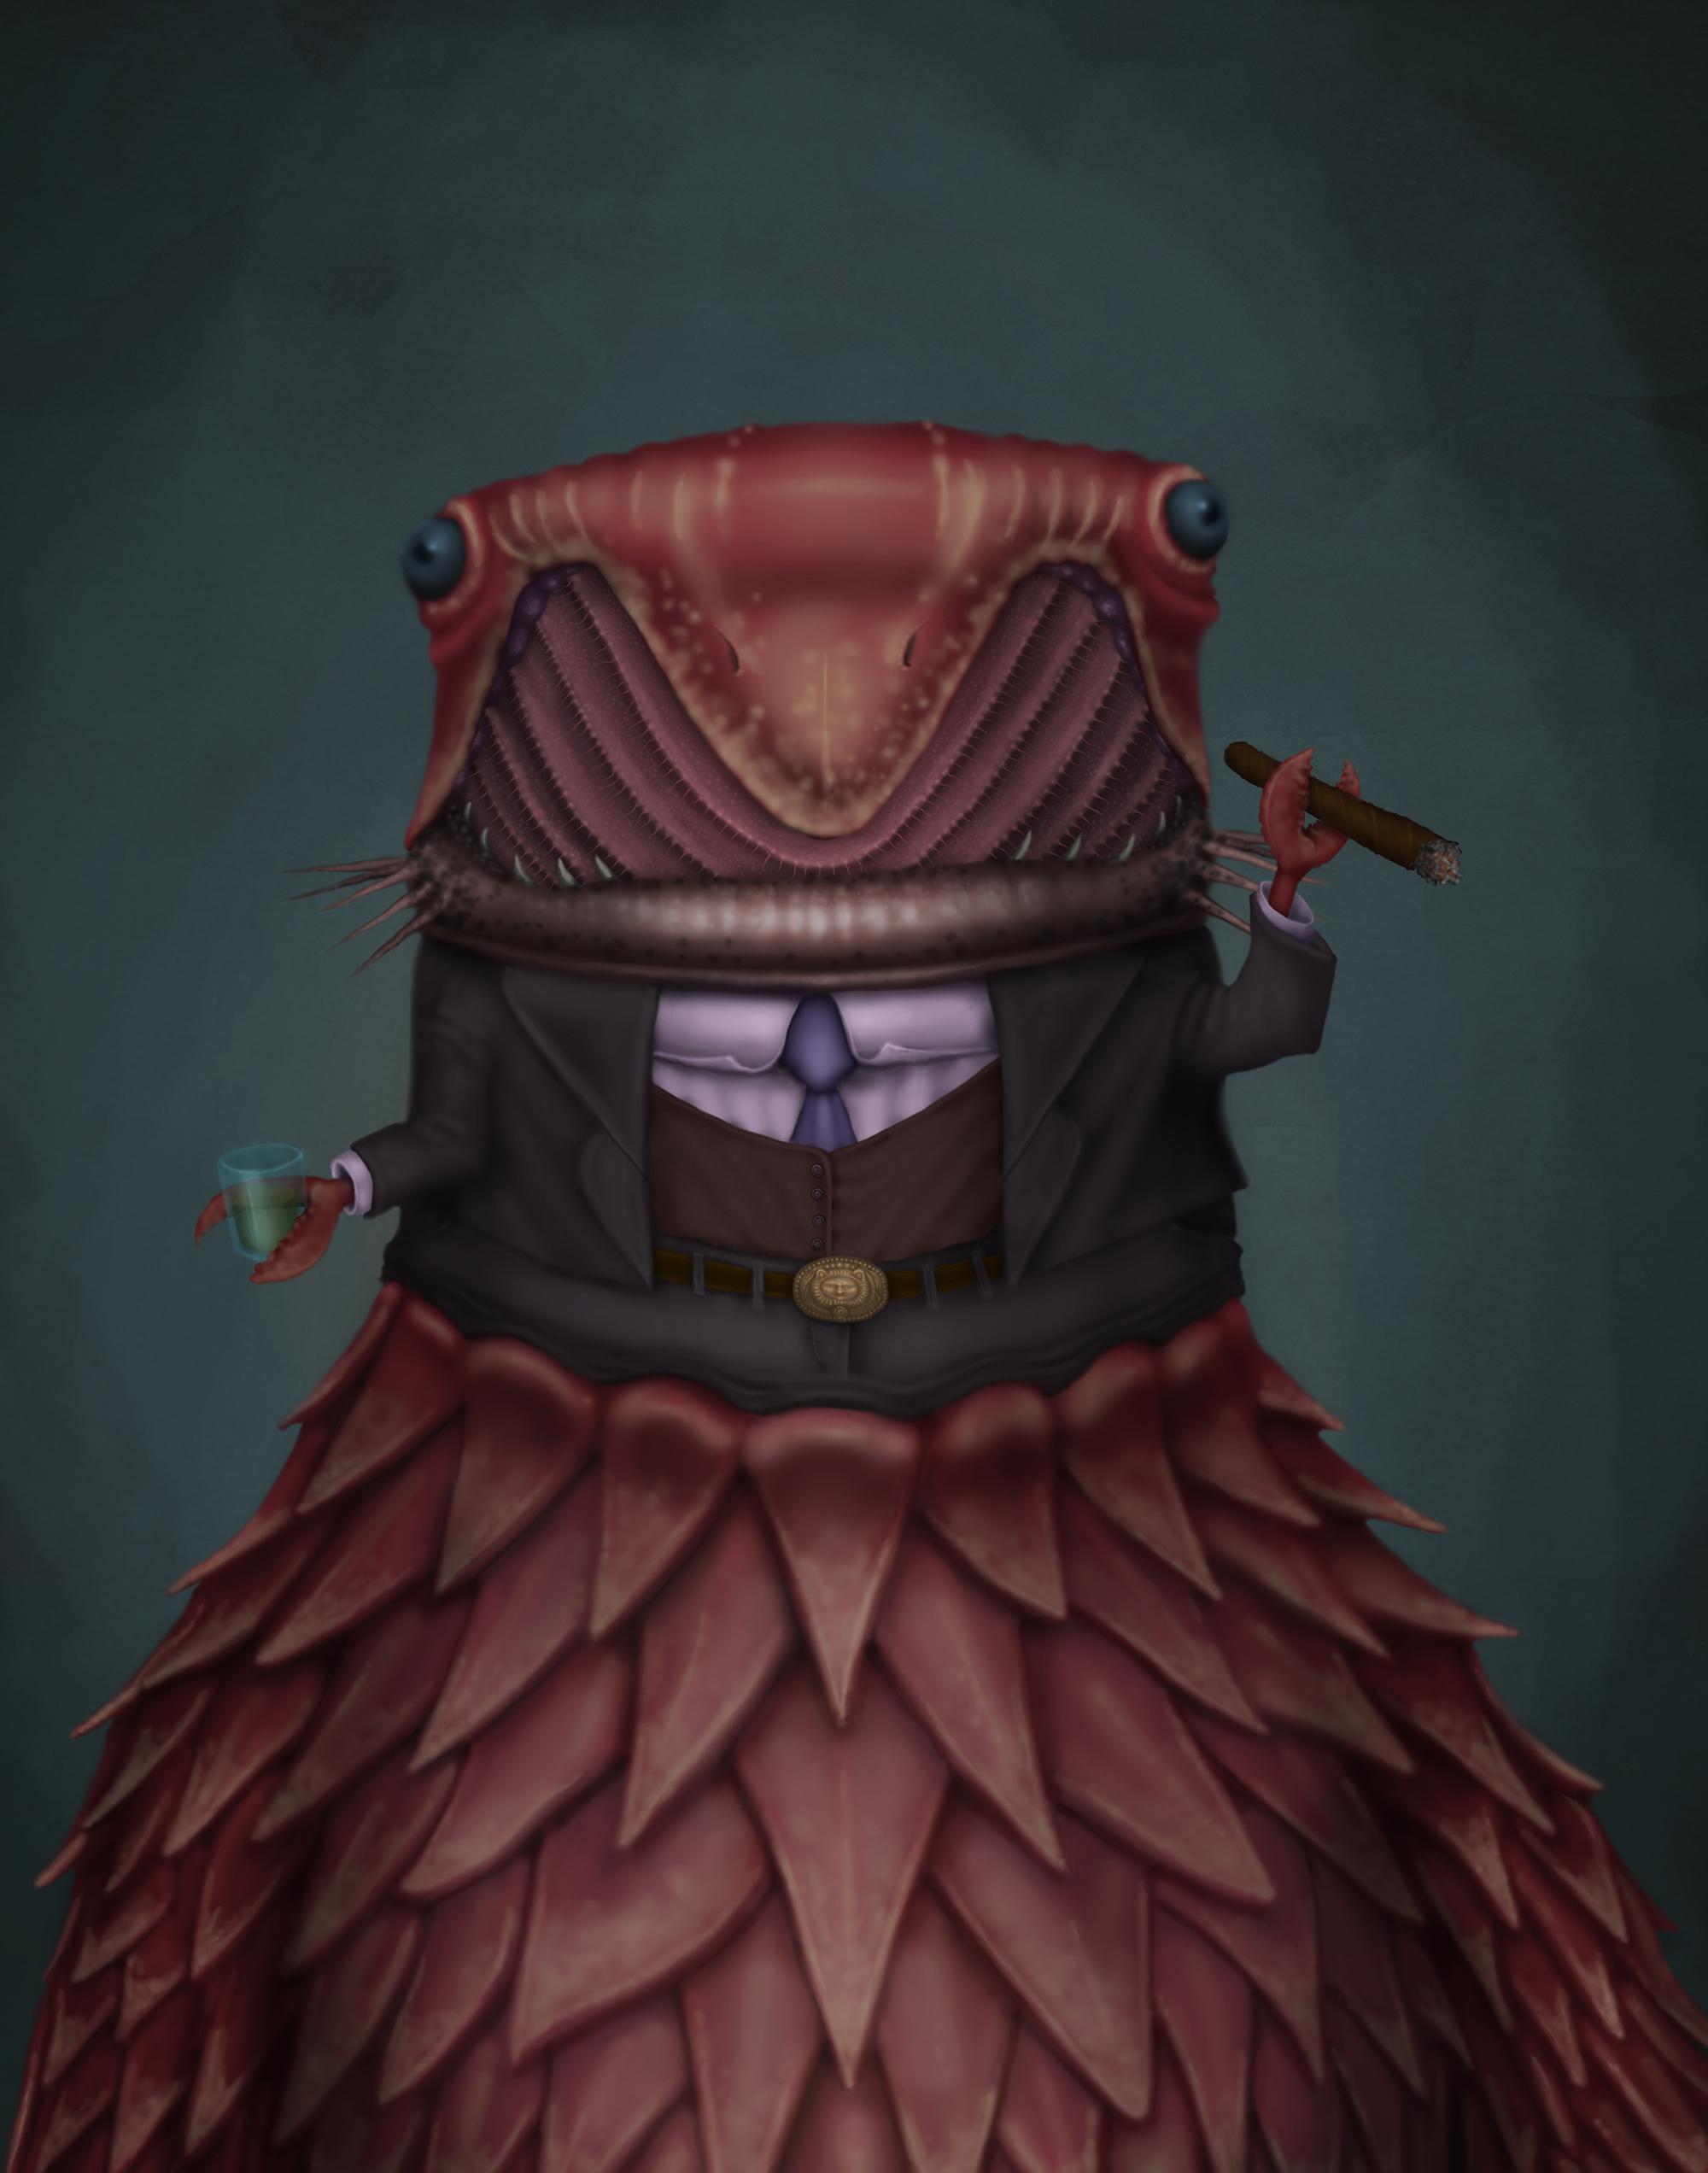 gill bird man3 small.jpg